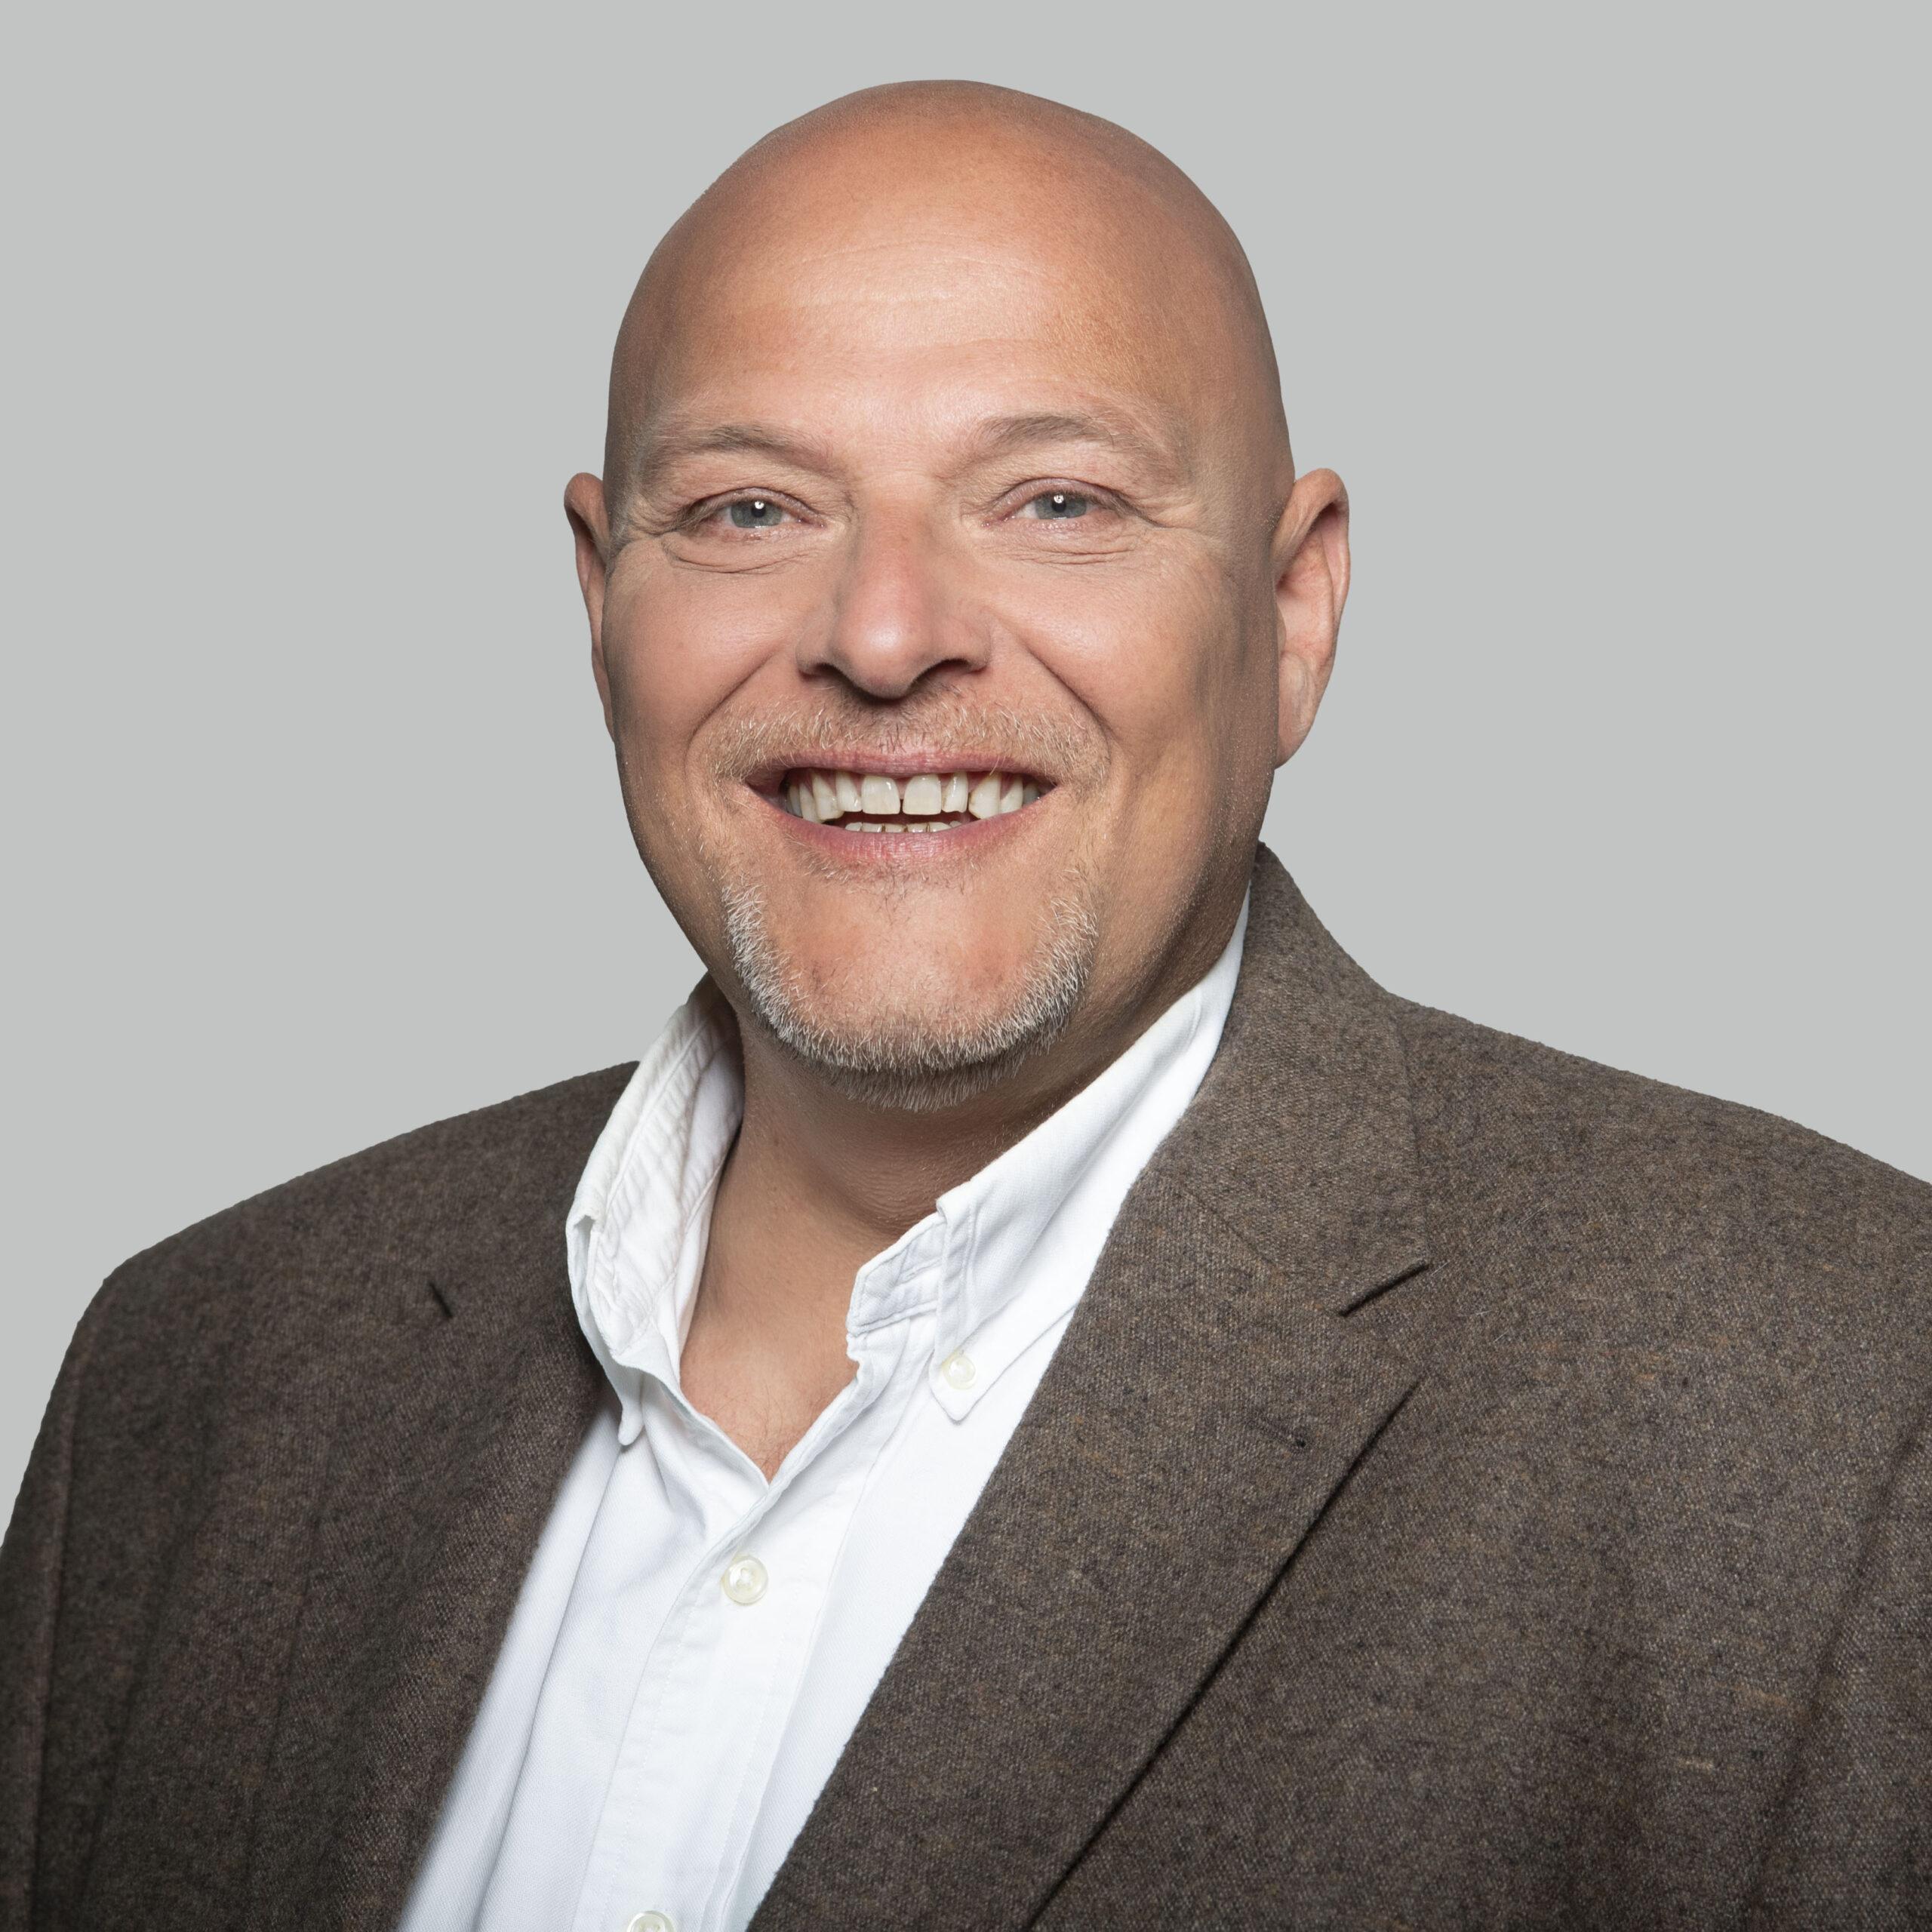 Richard van Es